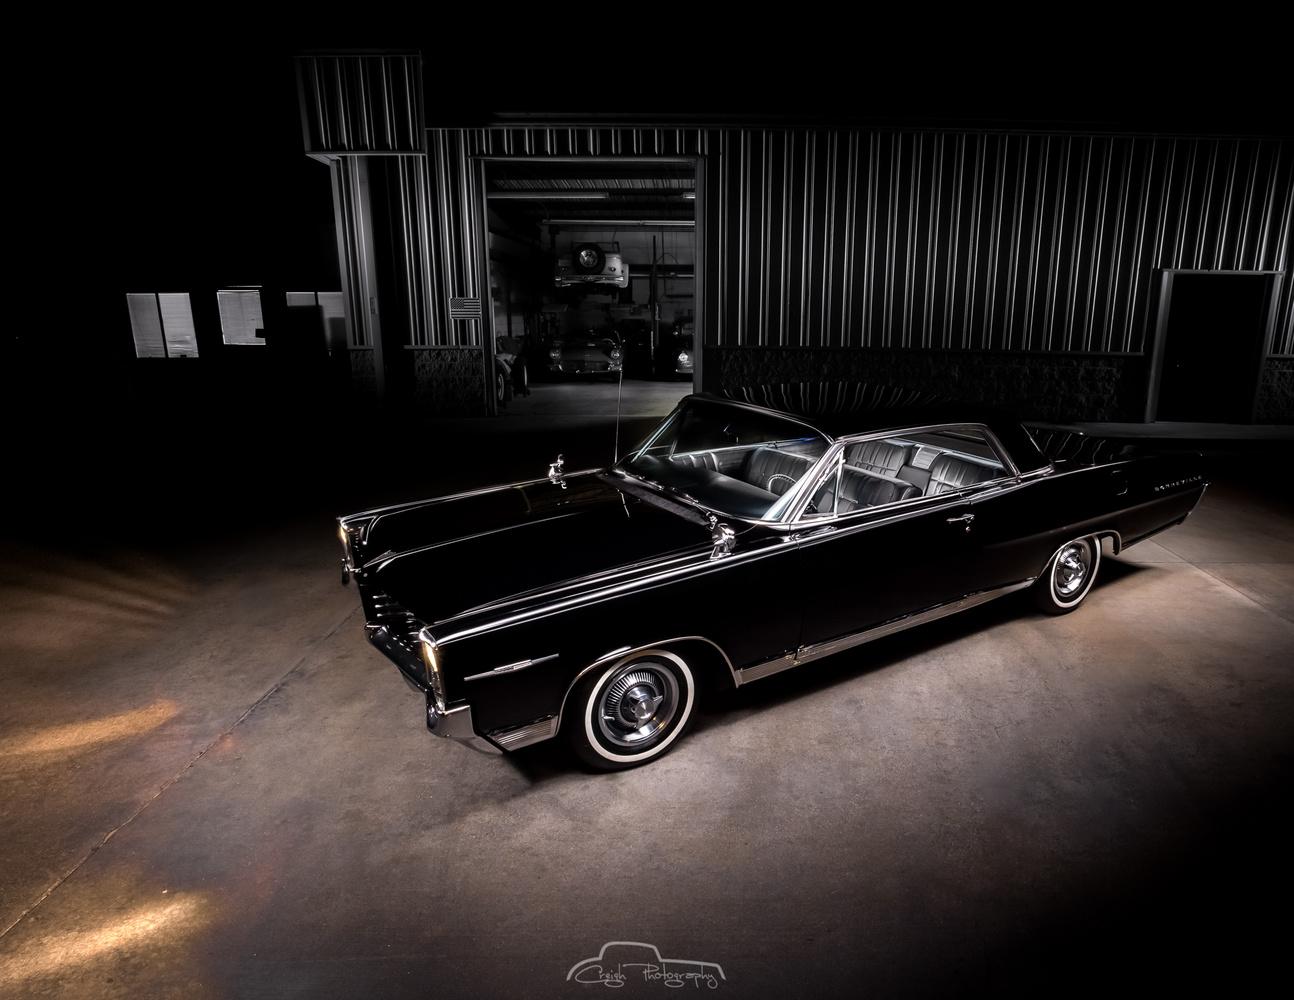 1966 Pontiac Bonneville by Creigh McIntyre